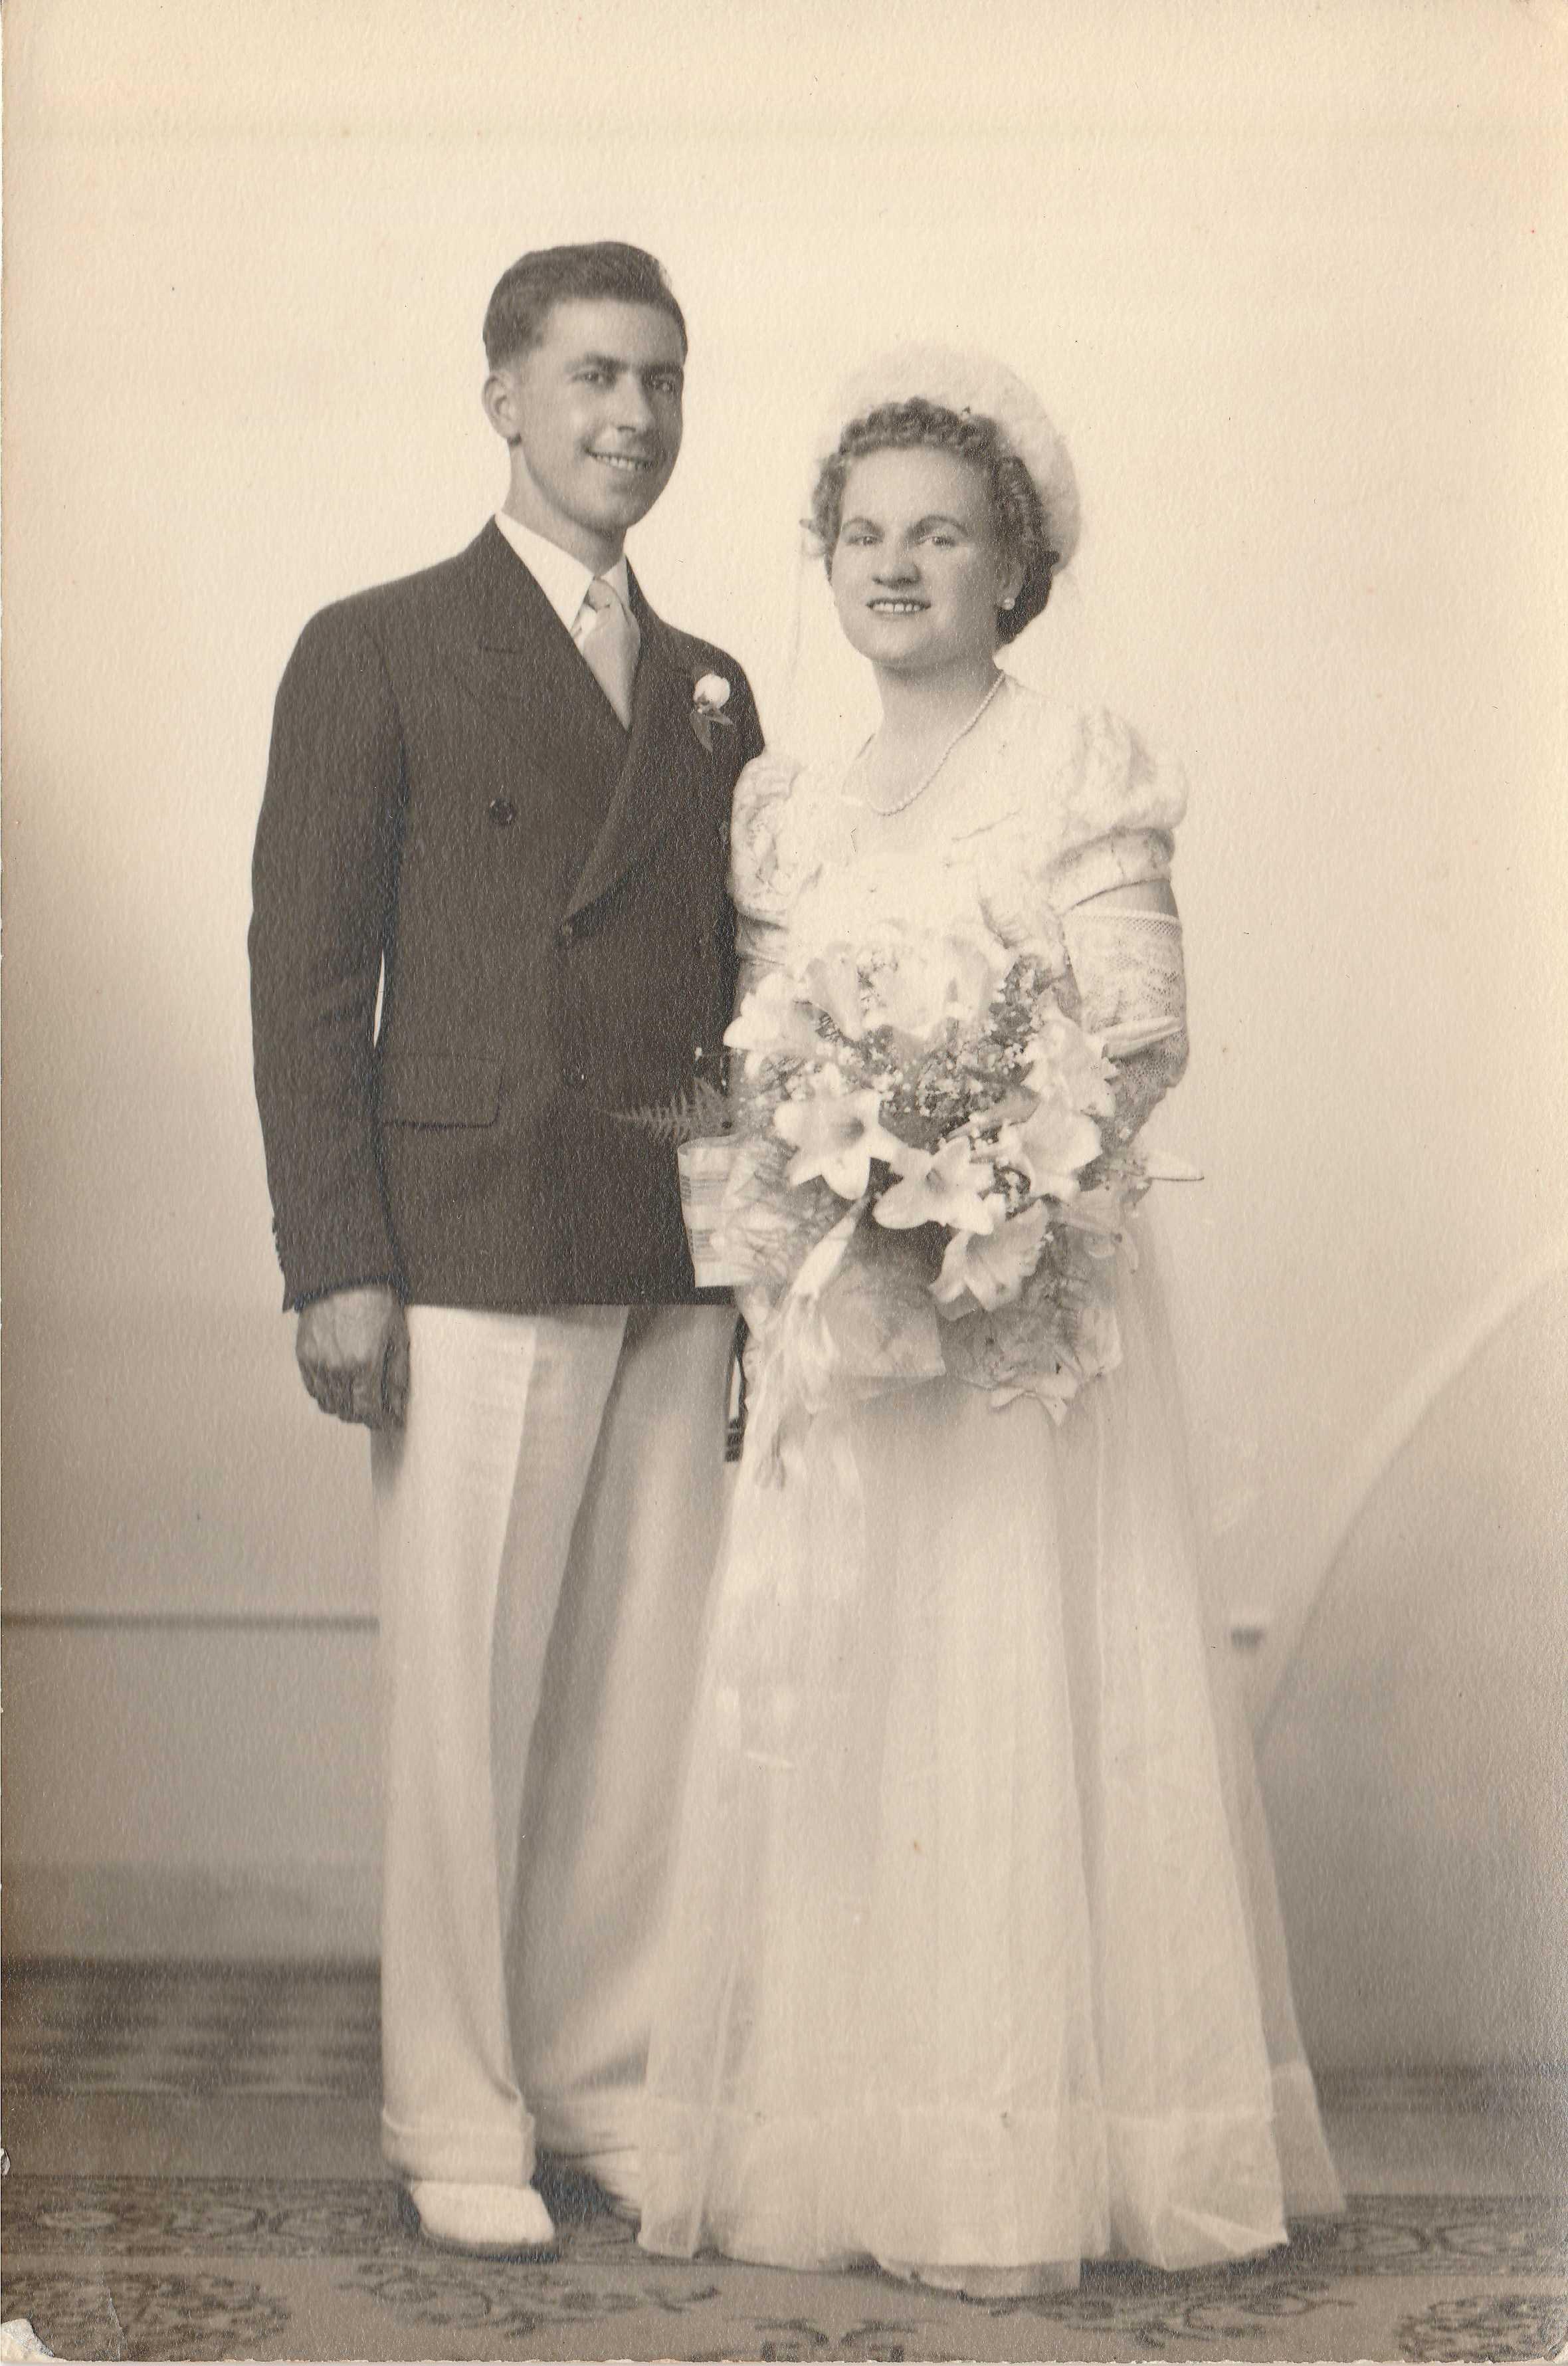 Joseph Adrian La Barre and Carmen Bedard wedding photo.